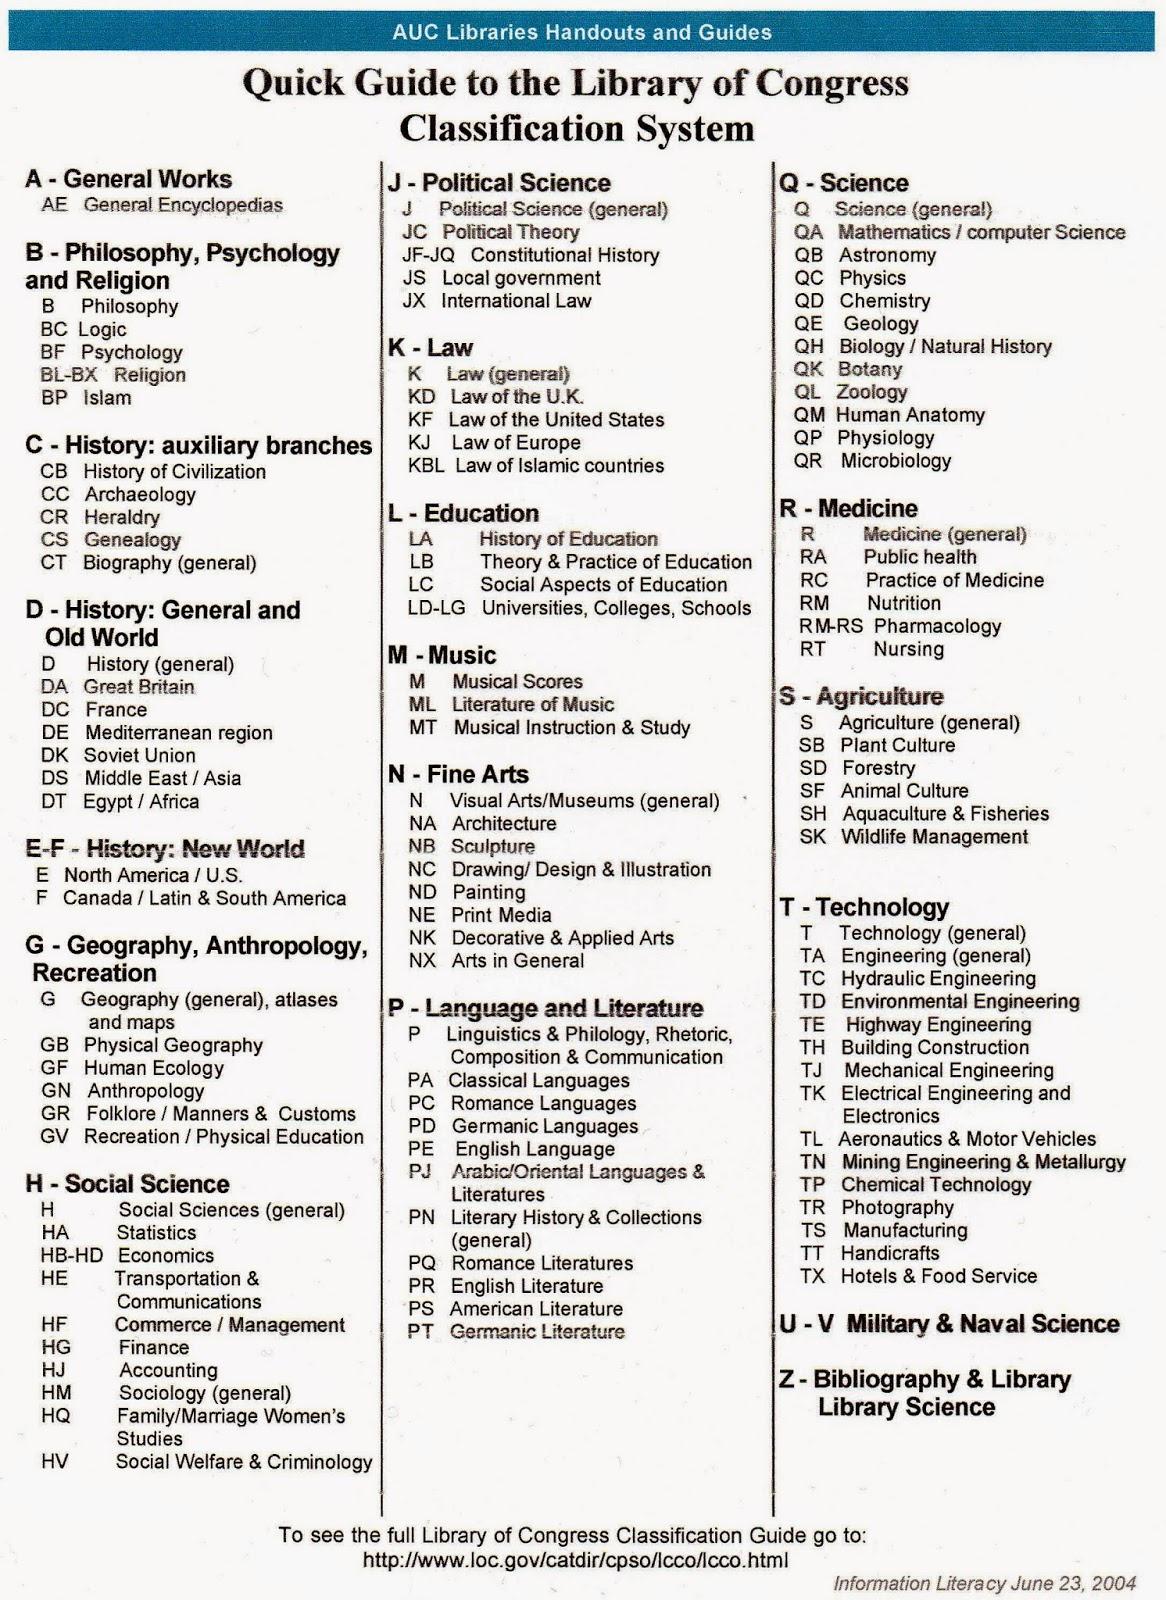 Download Dewey Decimal System Chart